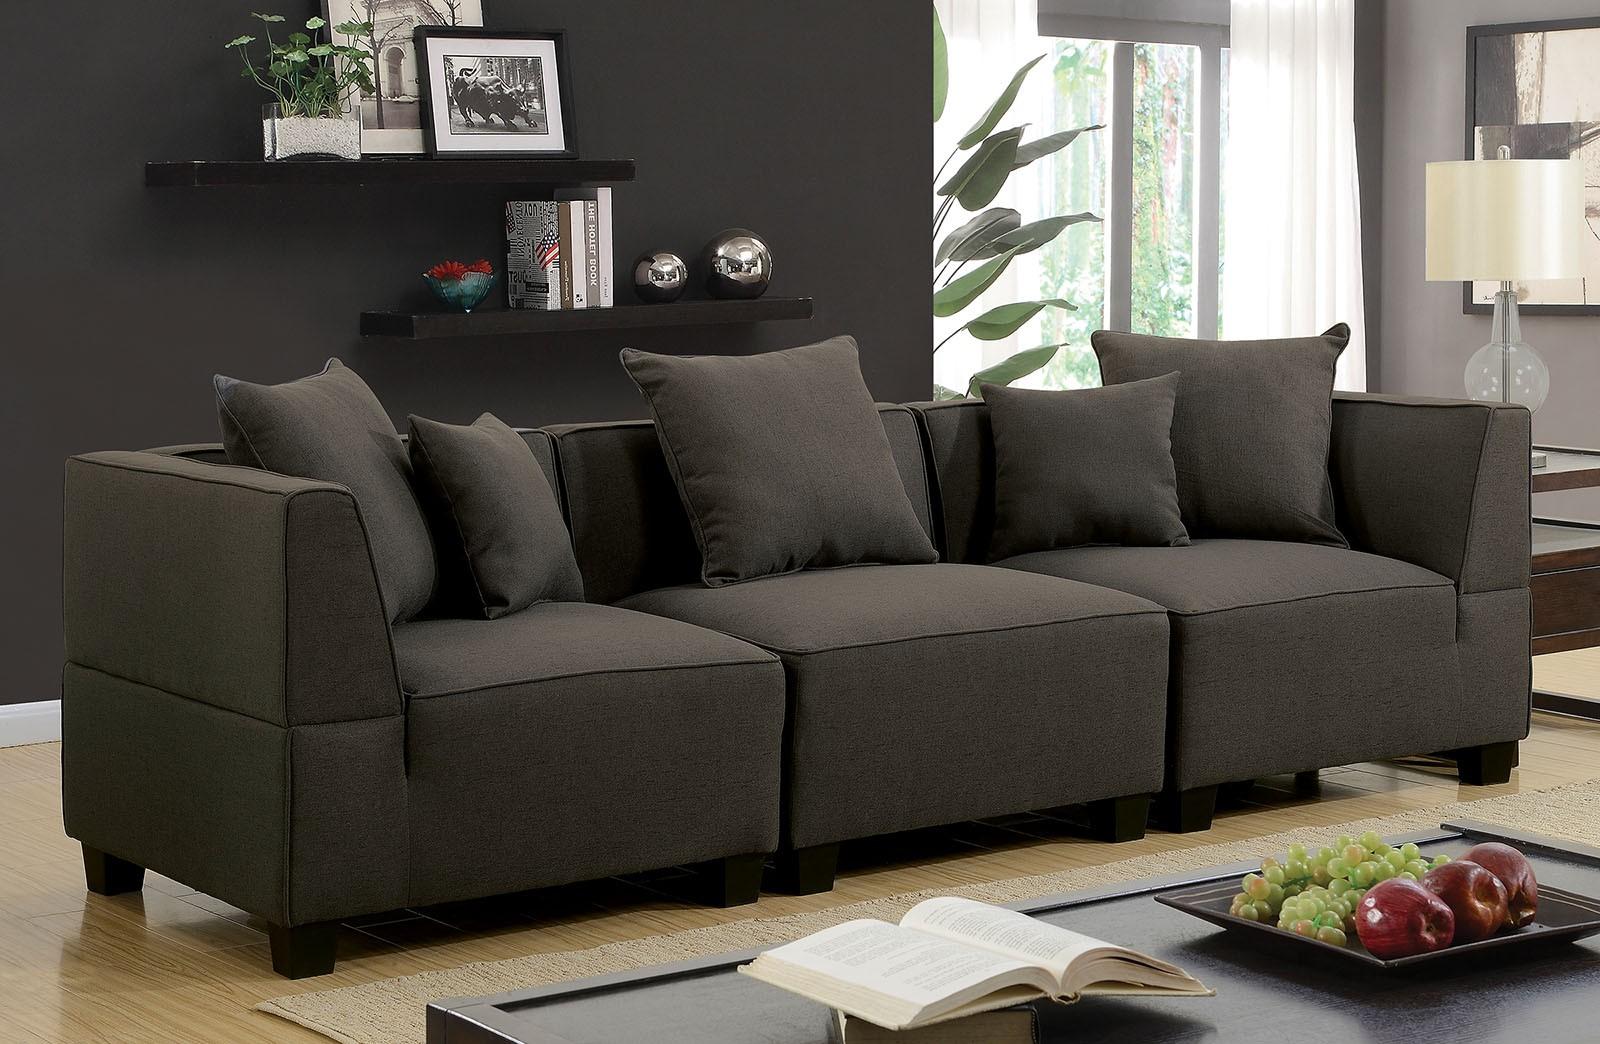 Fine Gray Soft Linen Like Fabric 3Pc Sectional Sofa Set Modular Design Living Room Pabps2019 Chair Design Images Pabps2019Com